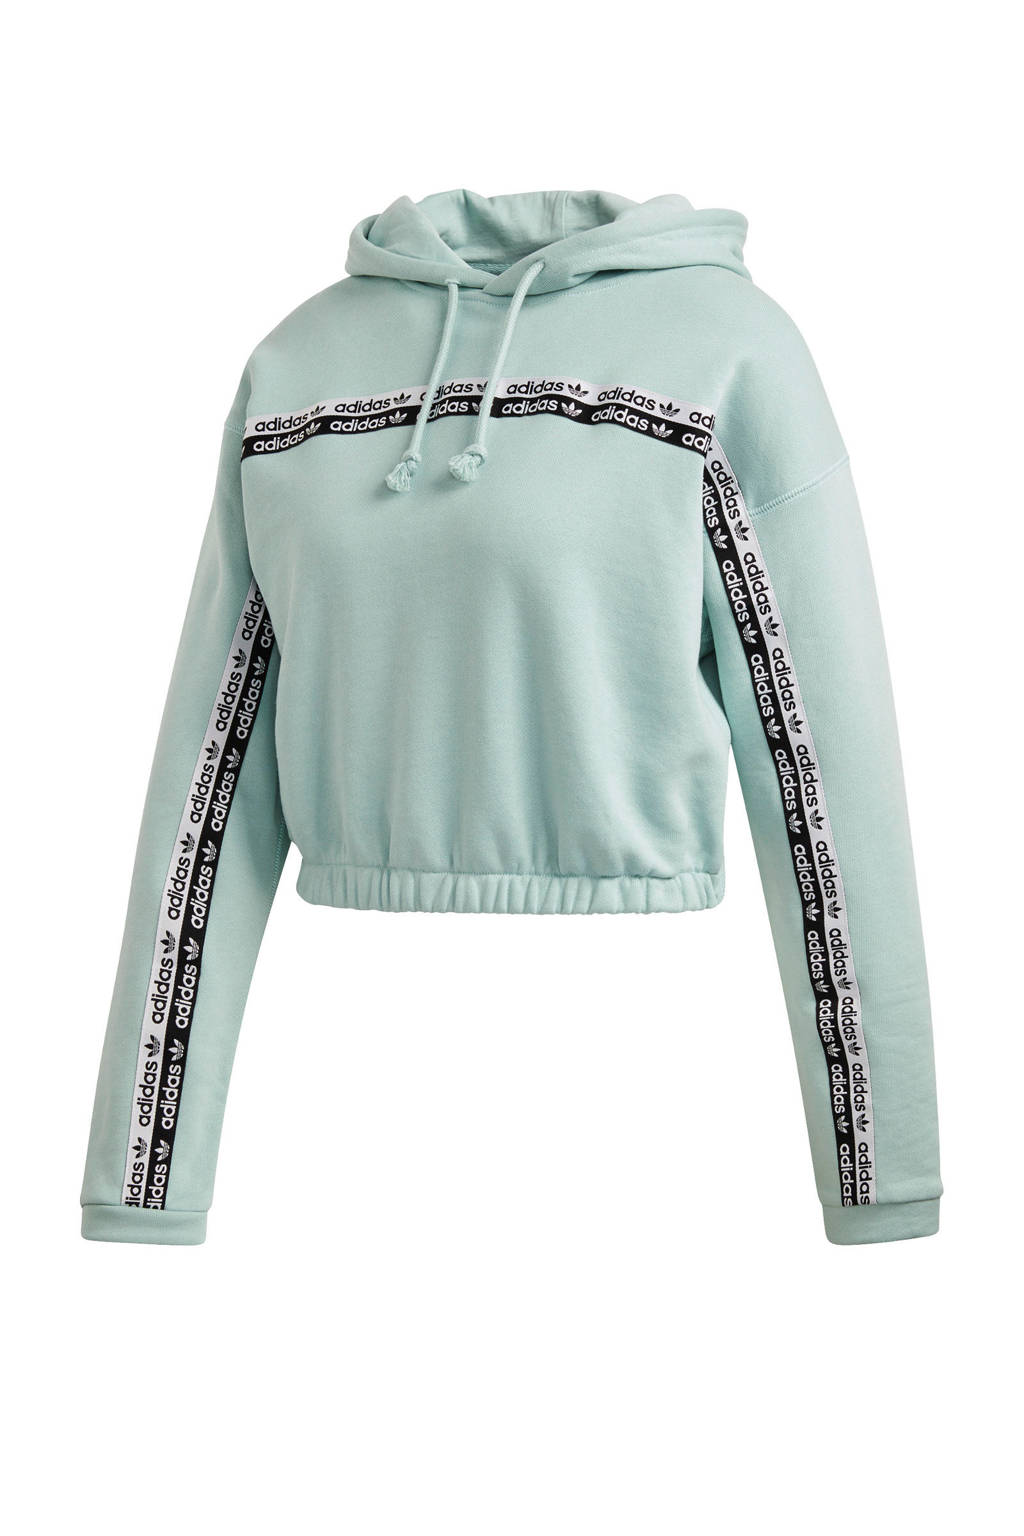 adidas Originals cropped hoodie mintgroen, Mintgroen